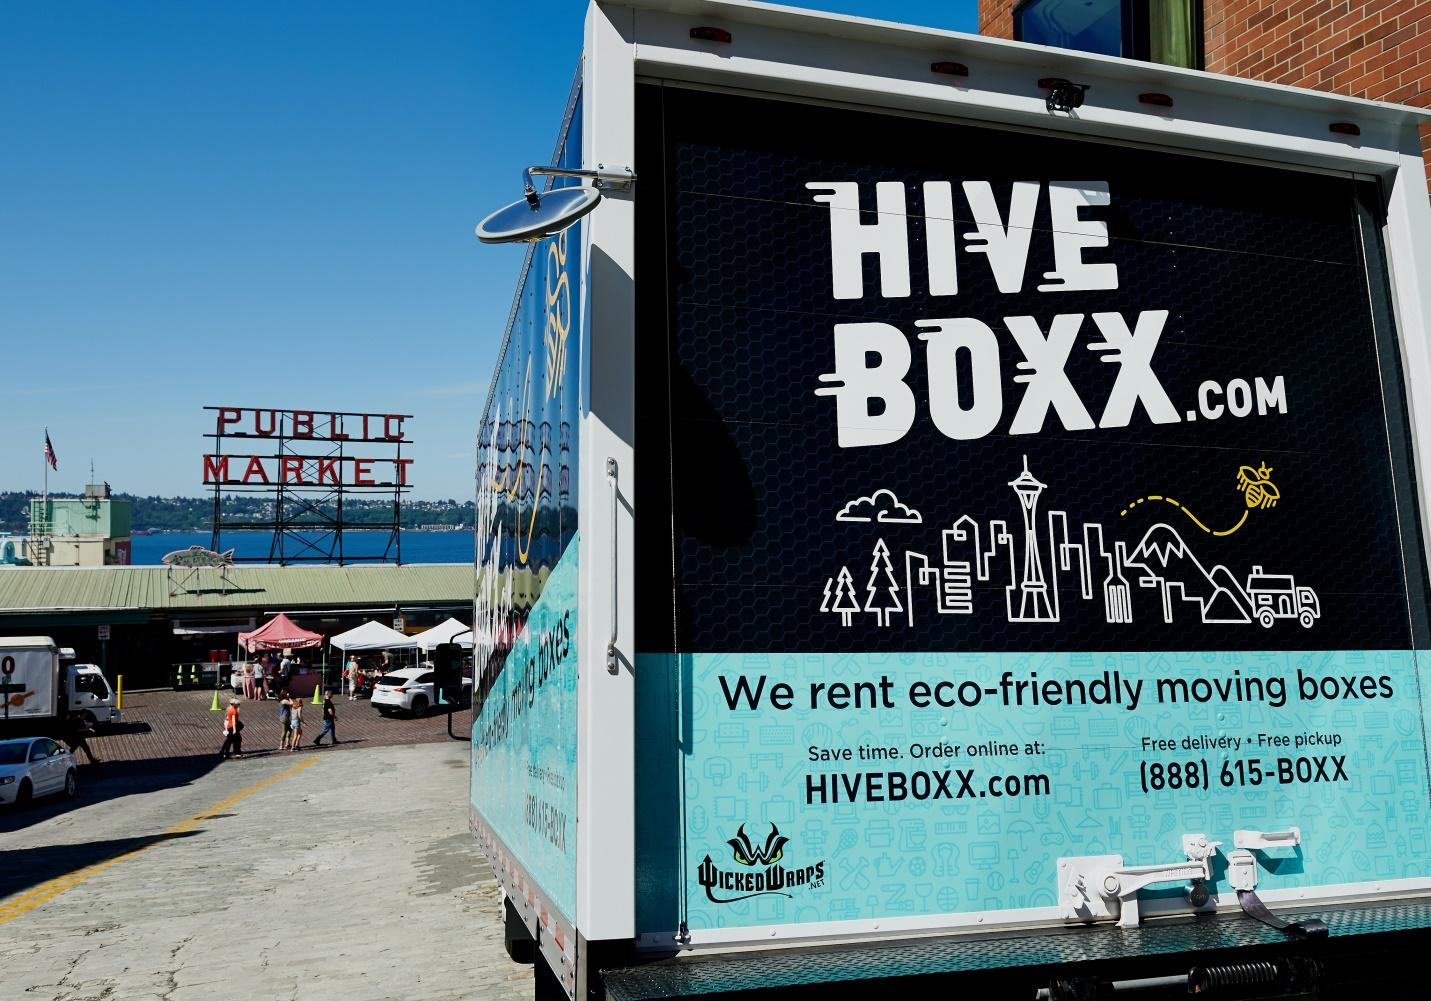 A HiveBoxx.com mobile billboard truck advertisement